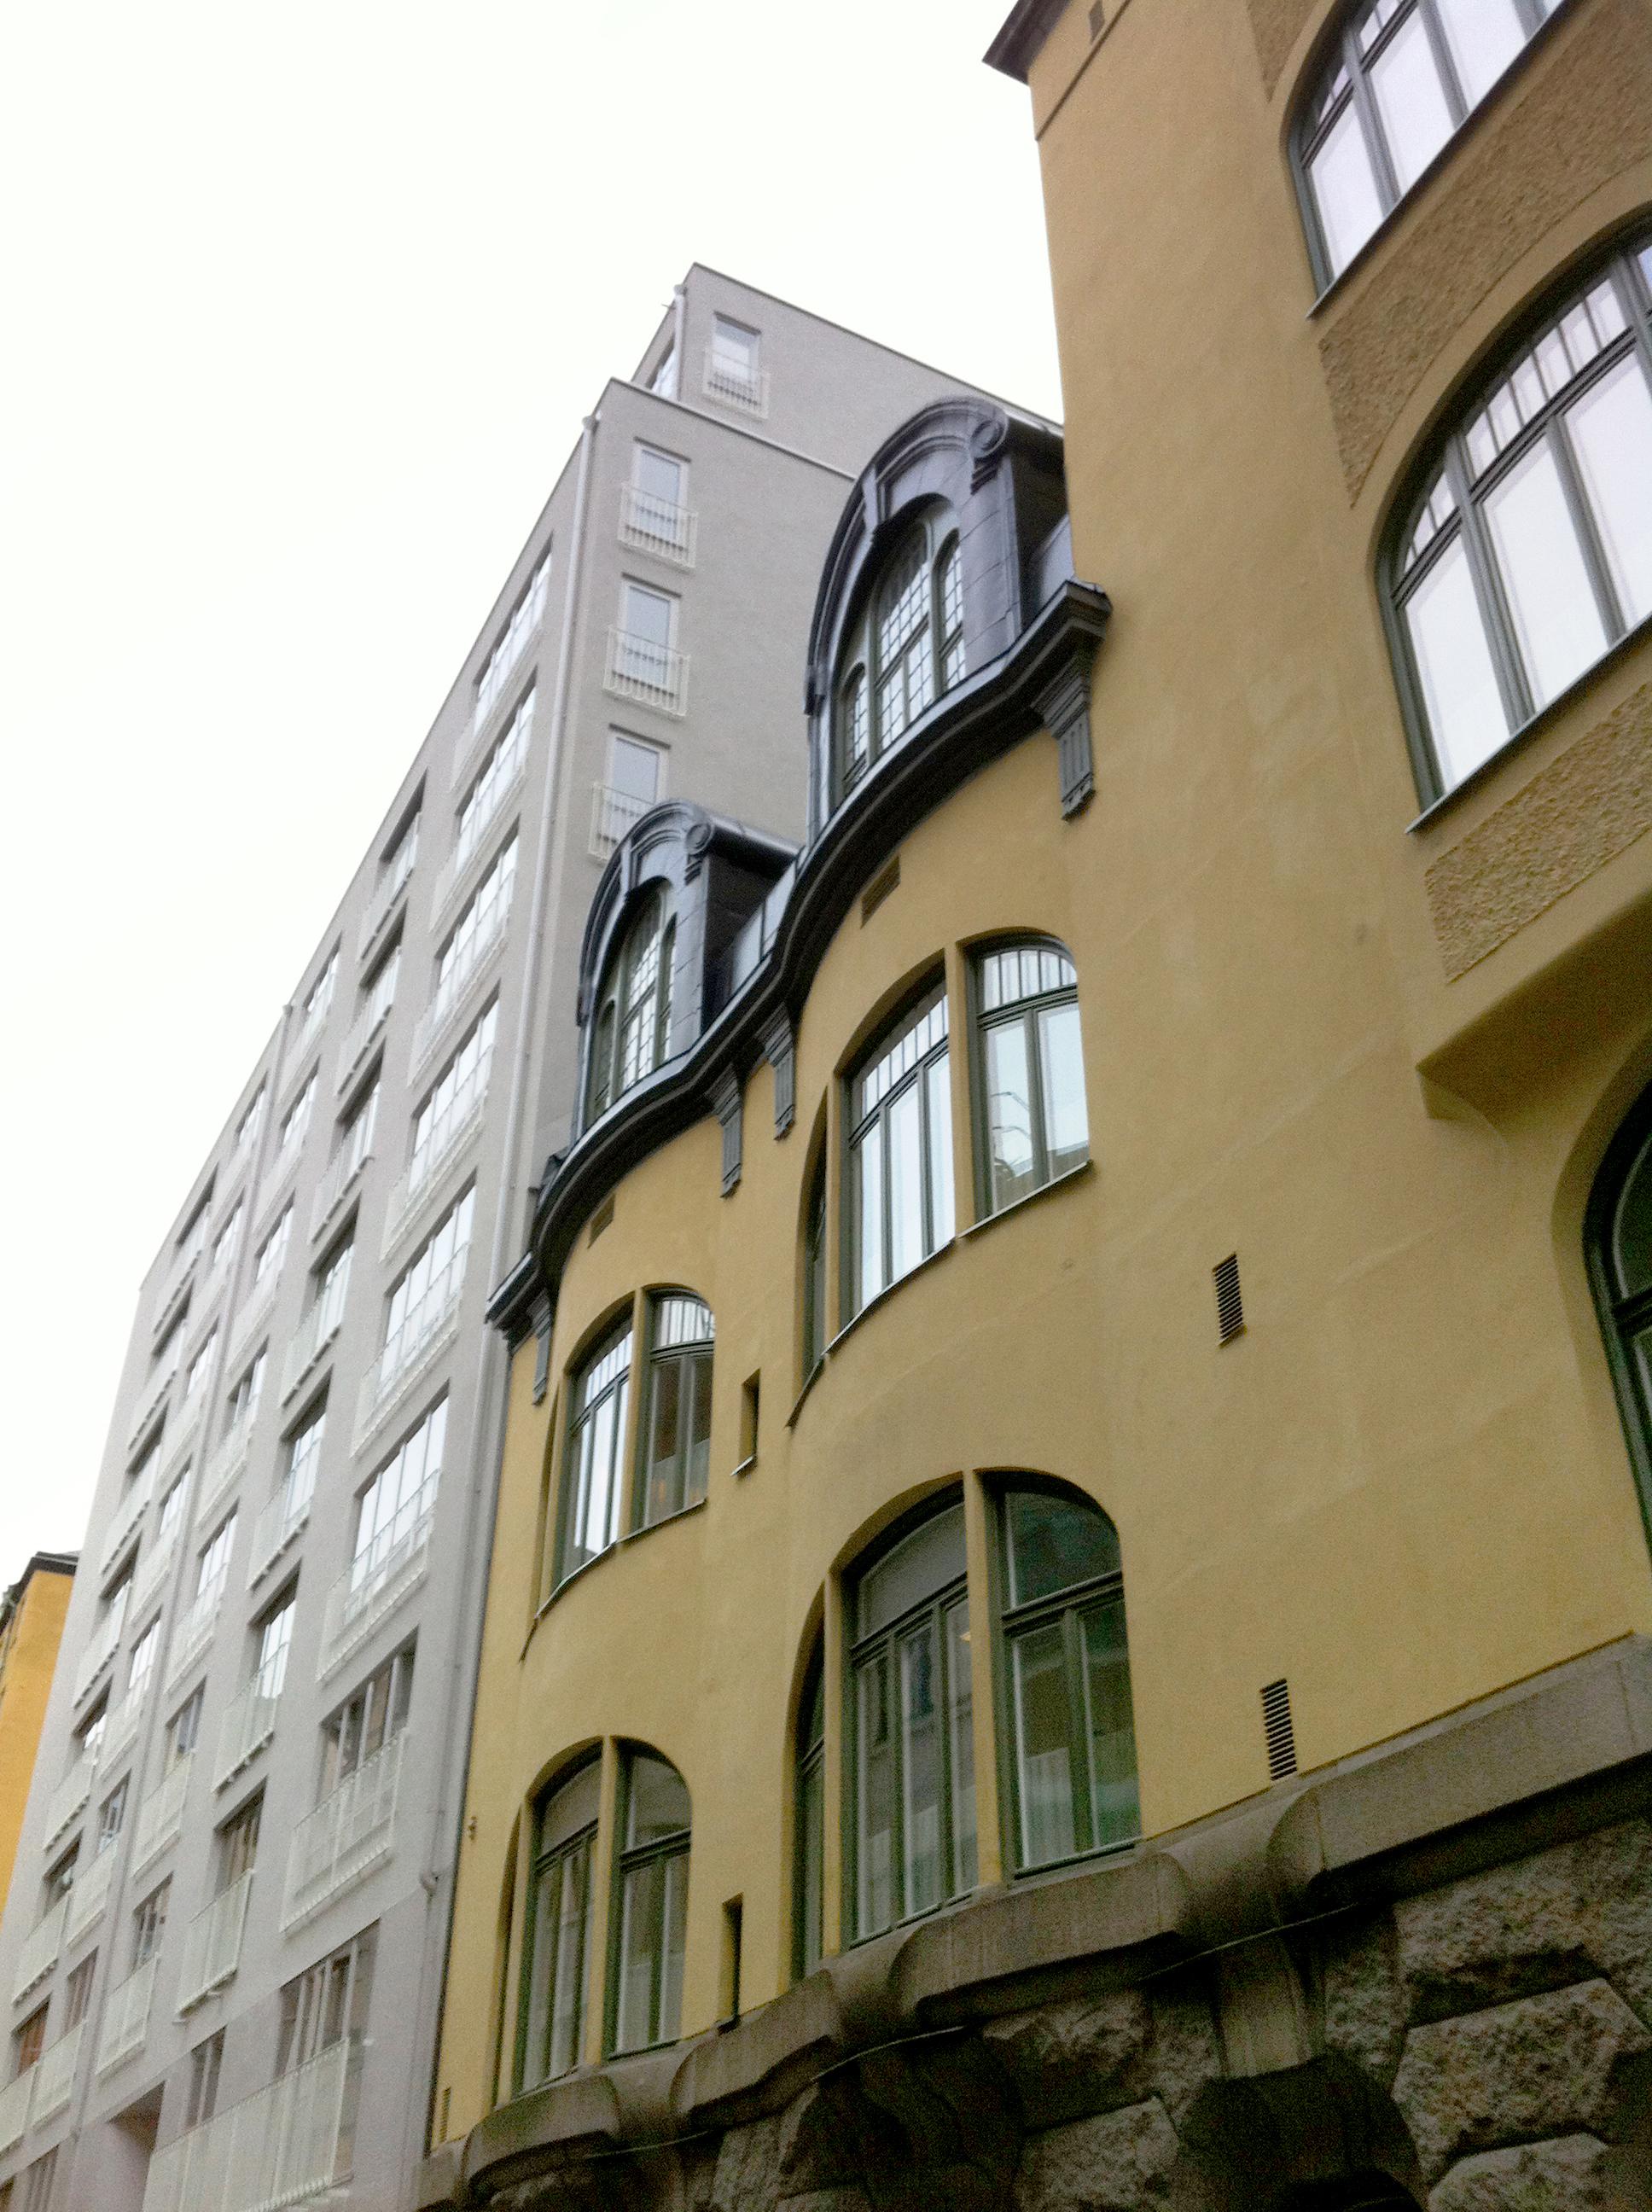 Ny byggnad i närheten av Adolf Fredrik kyrka i centrala Stockholm. Foto Peter Lundevall